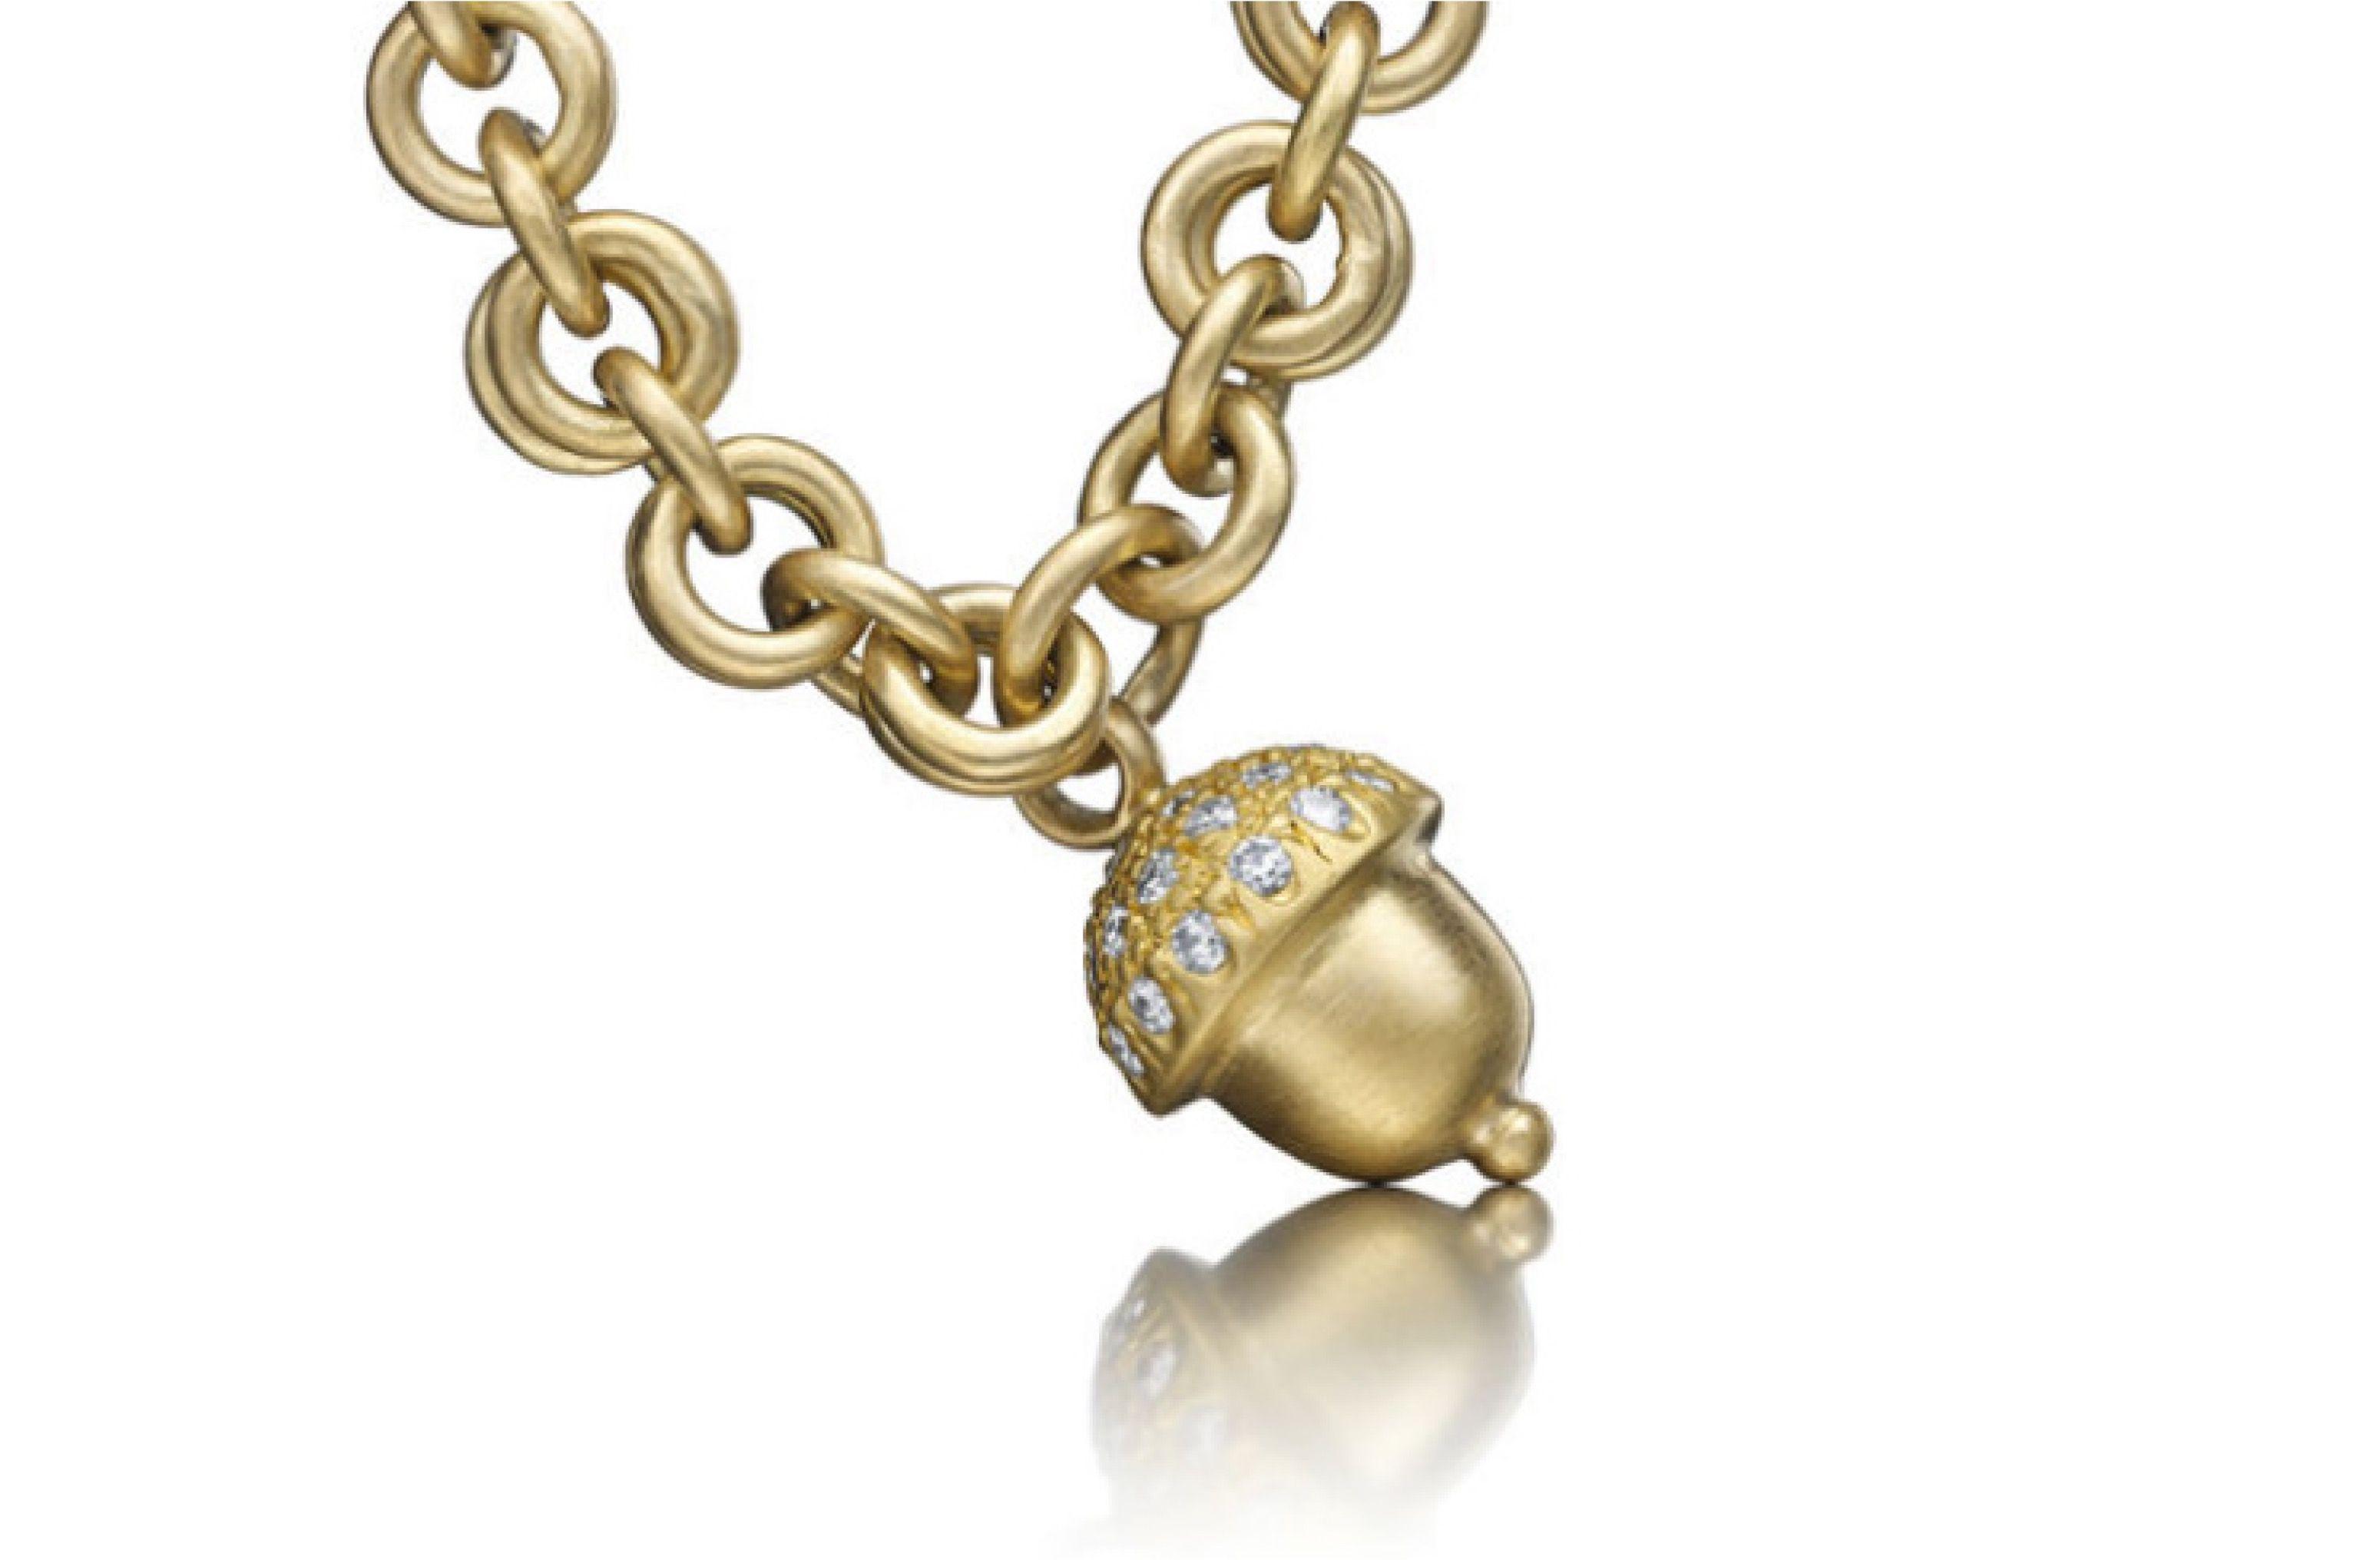 JewelryWhite_13.jpg